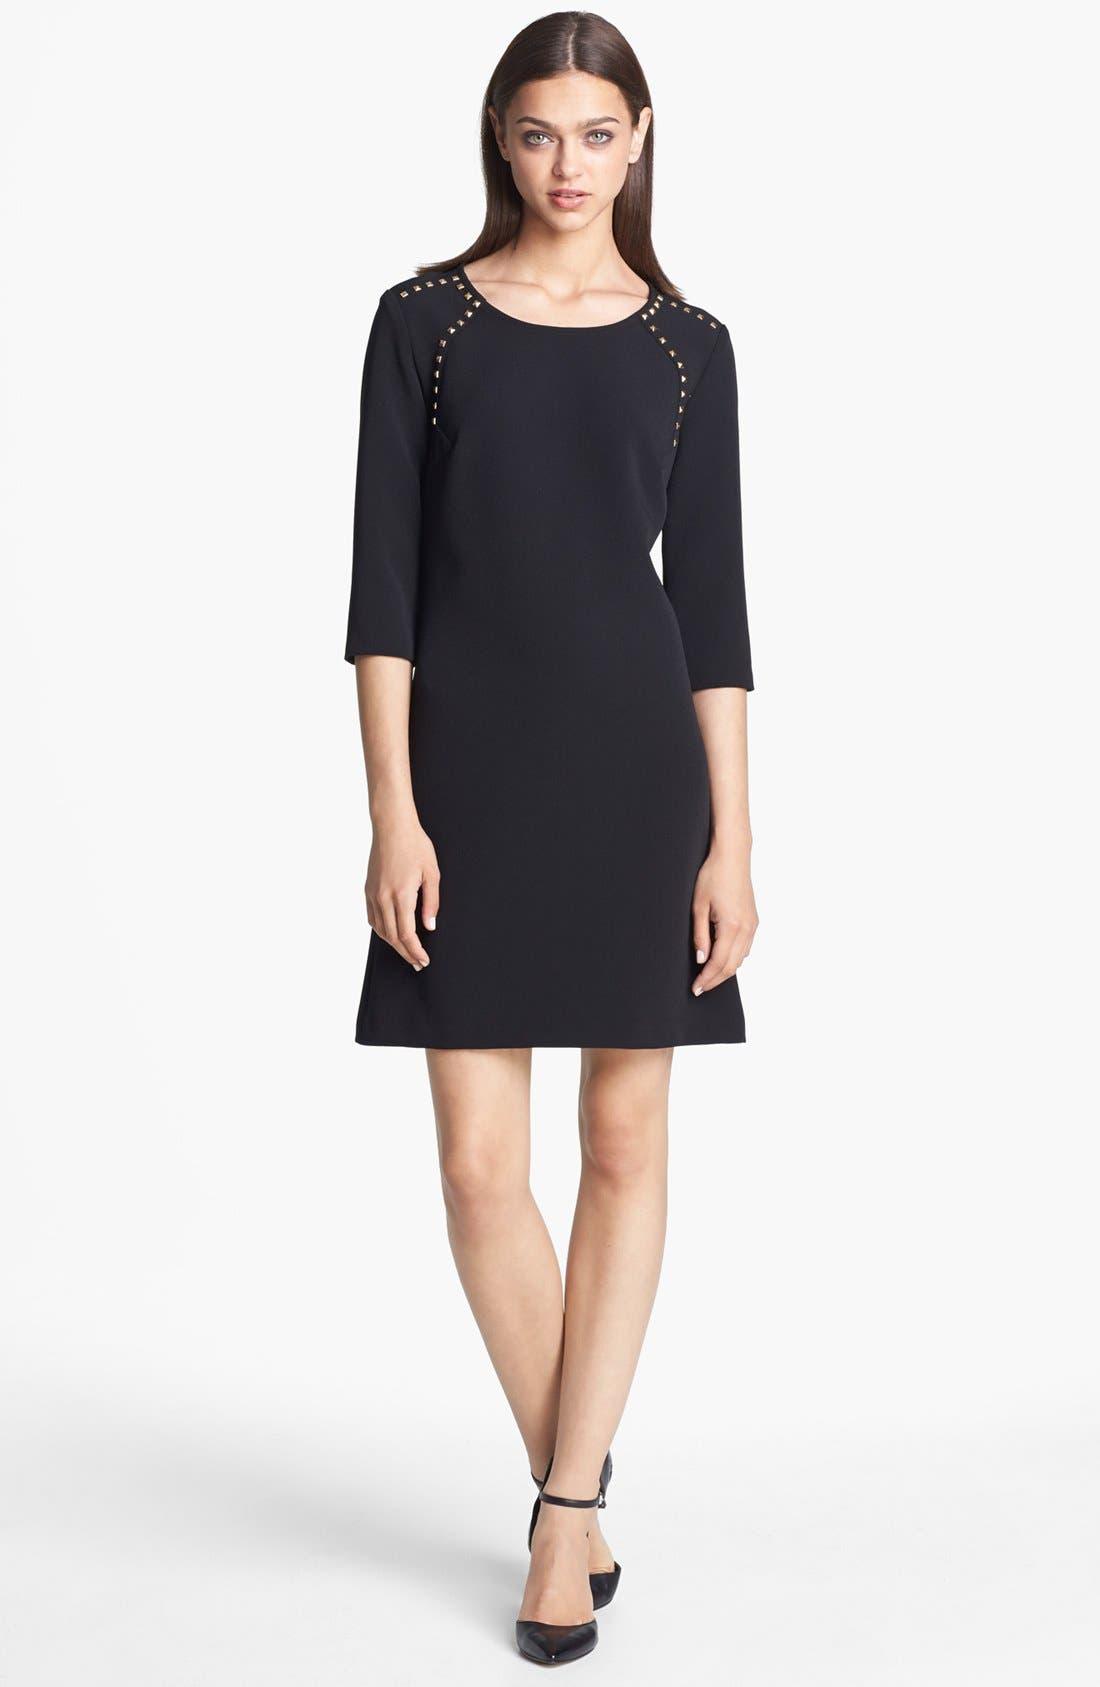 Alternate Image 1 Selected - Donna Morgan Studded Crepe Shift Dress (Online Only)